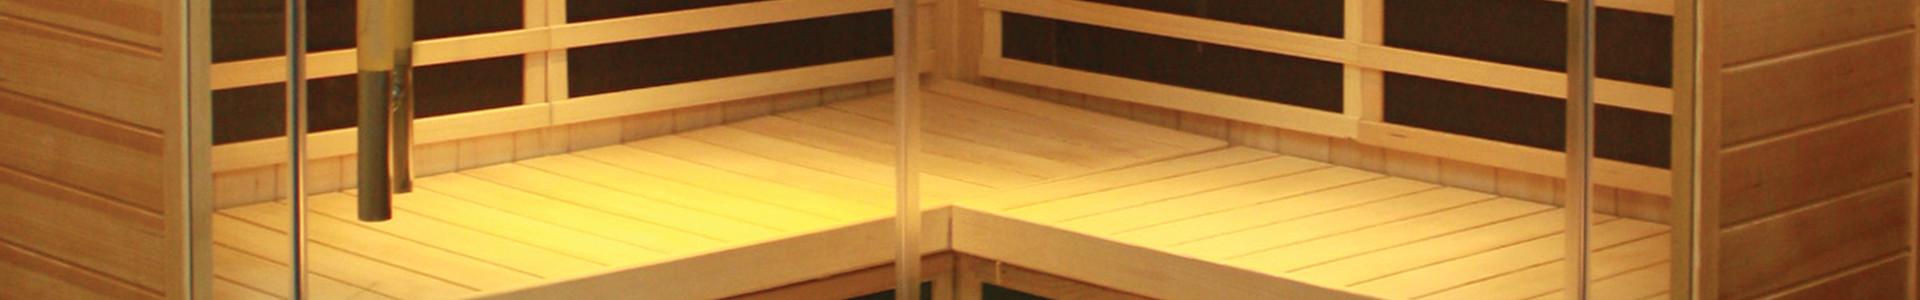 Sauna Soaking – What to Expect From Regular Use, Saunas Woodbury